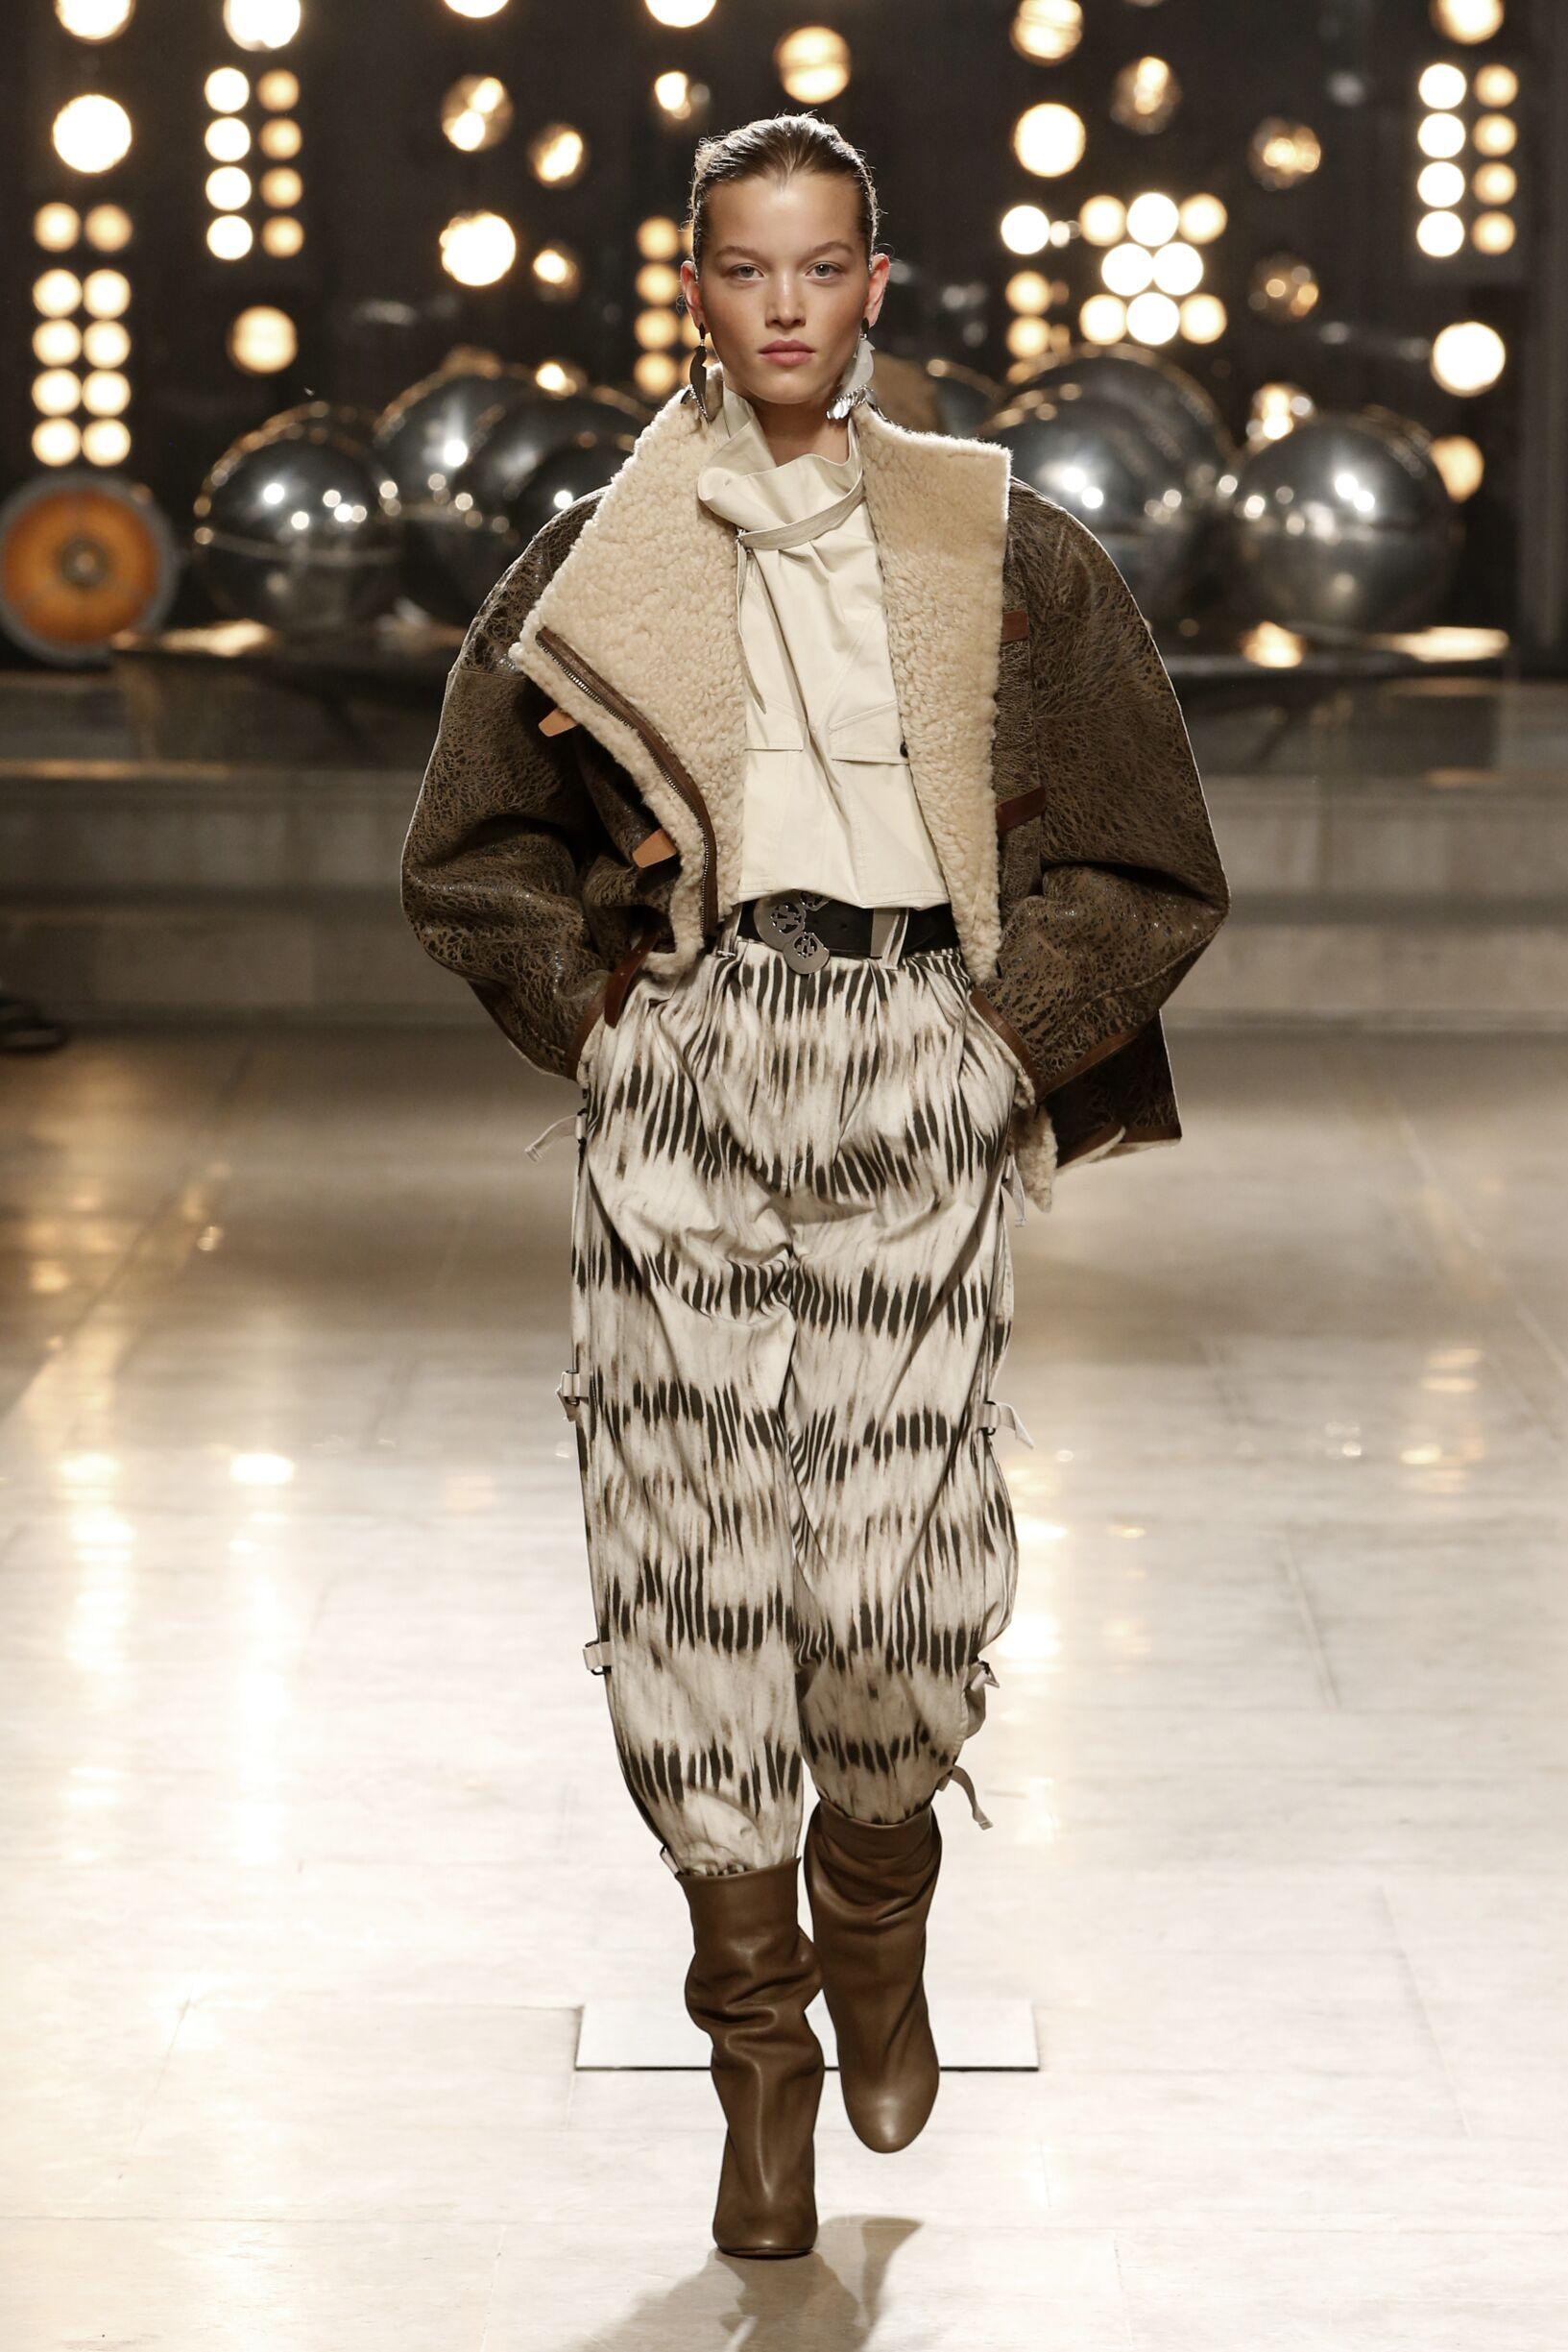 Fashion Show Woman Model Isabel Marant Catwalk